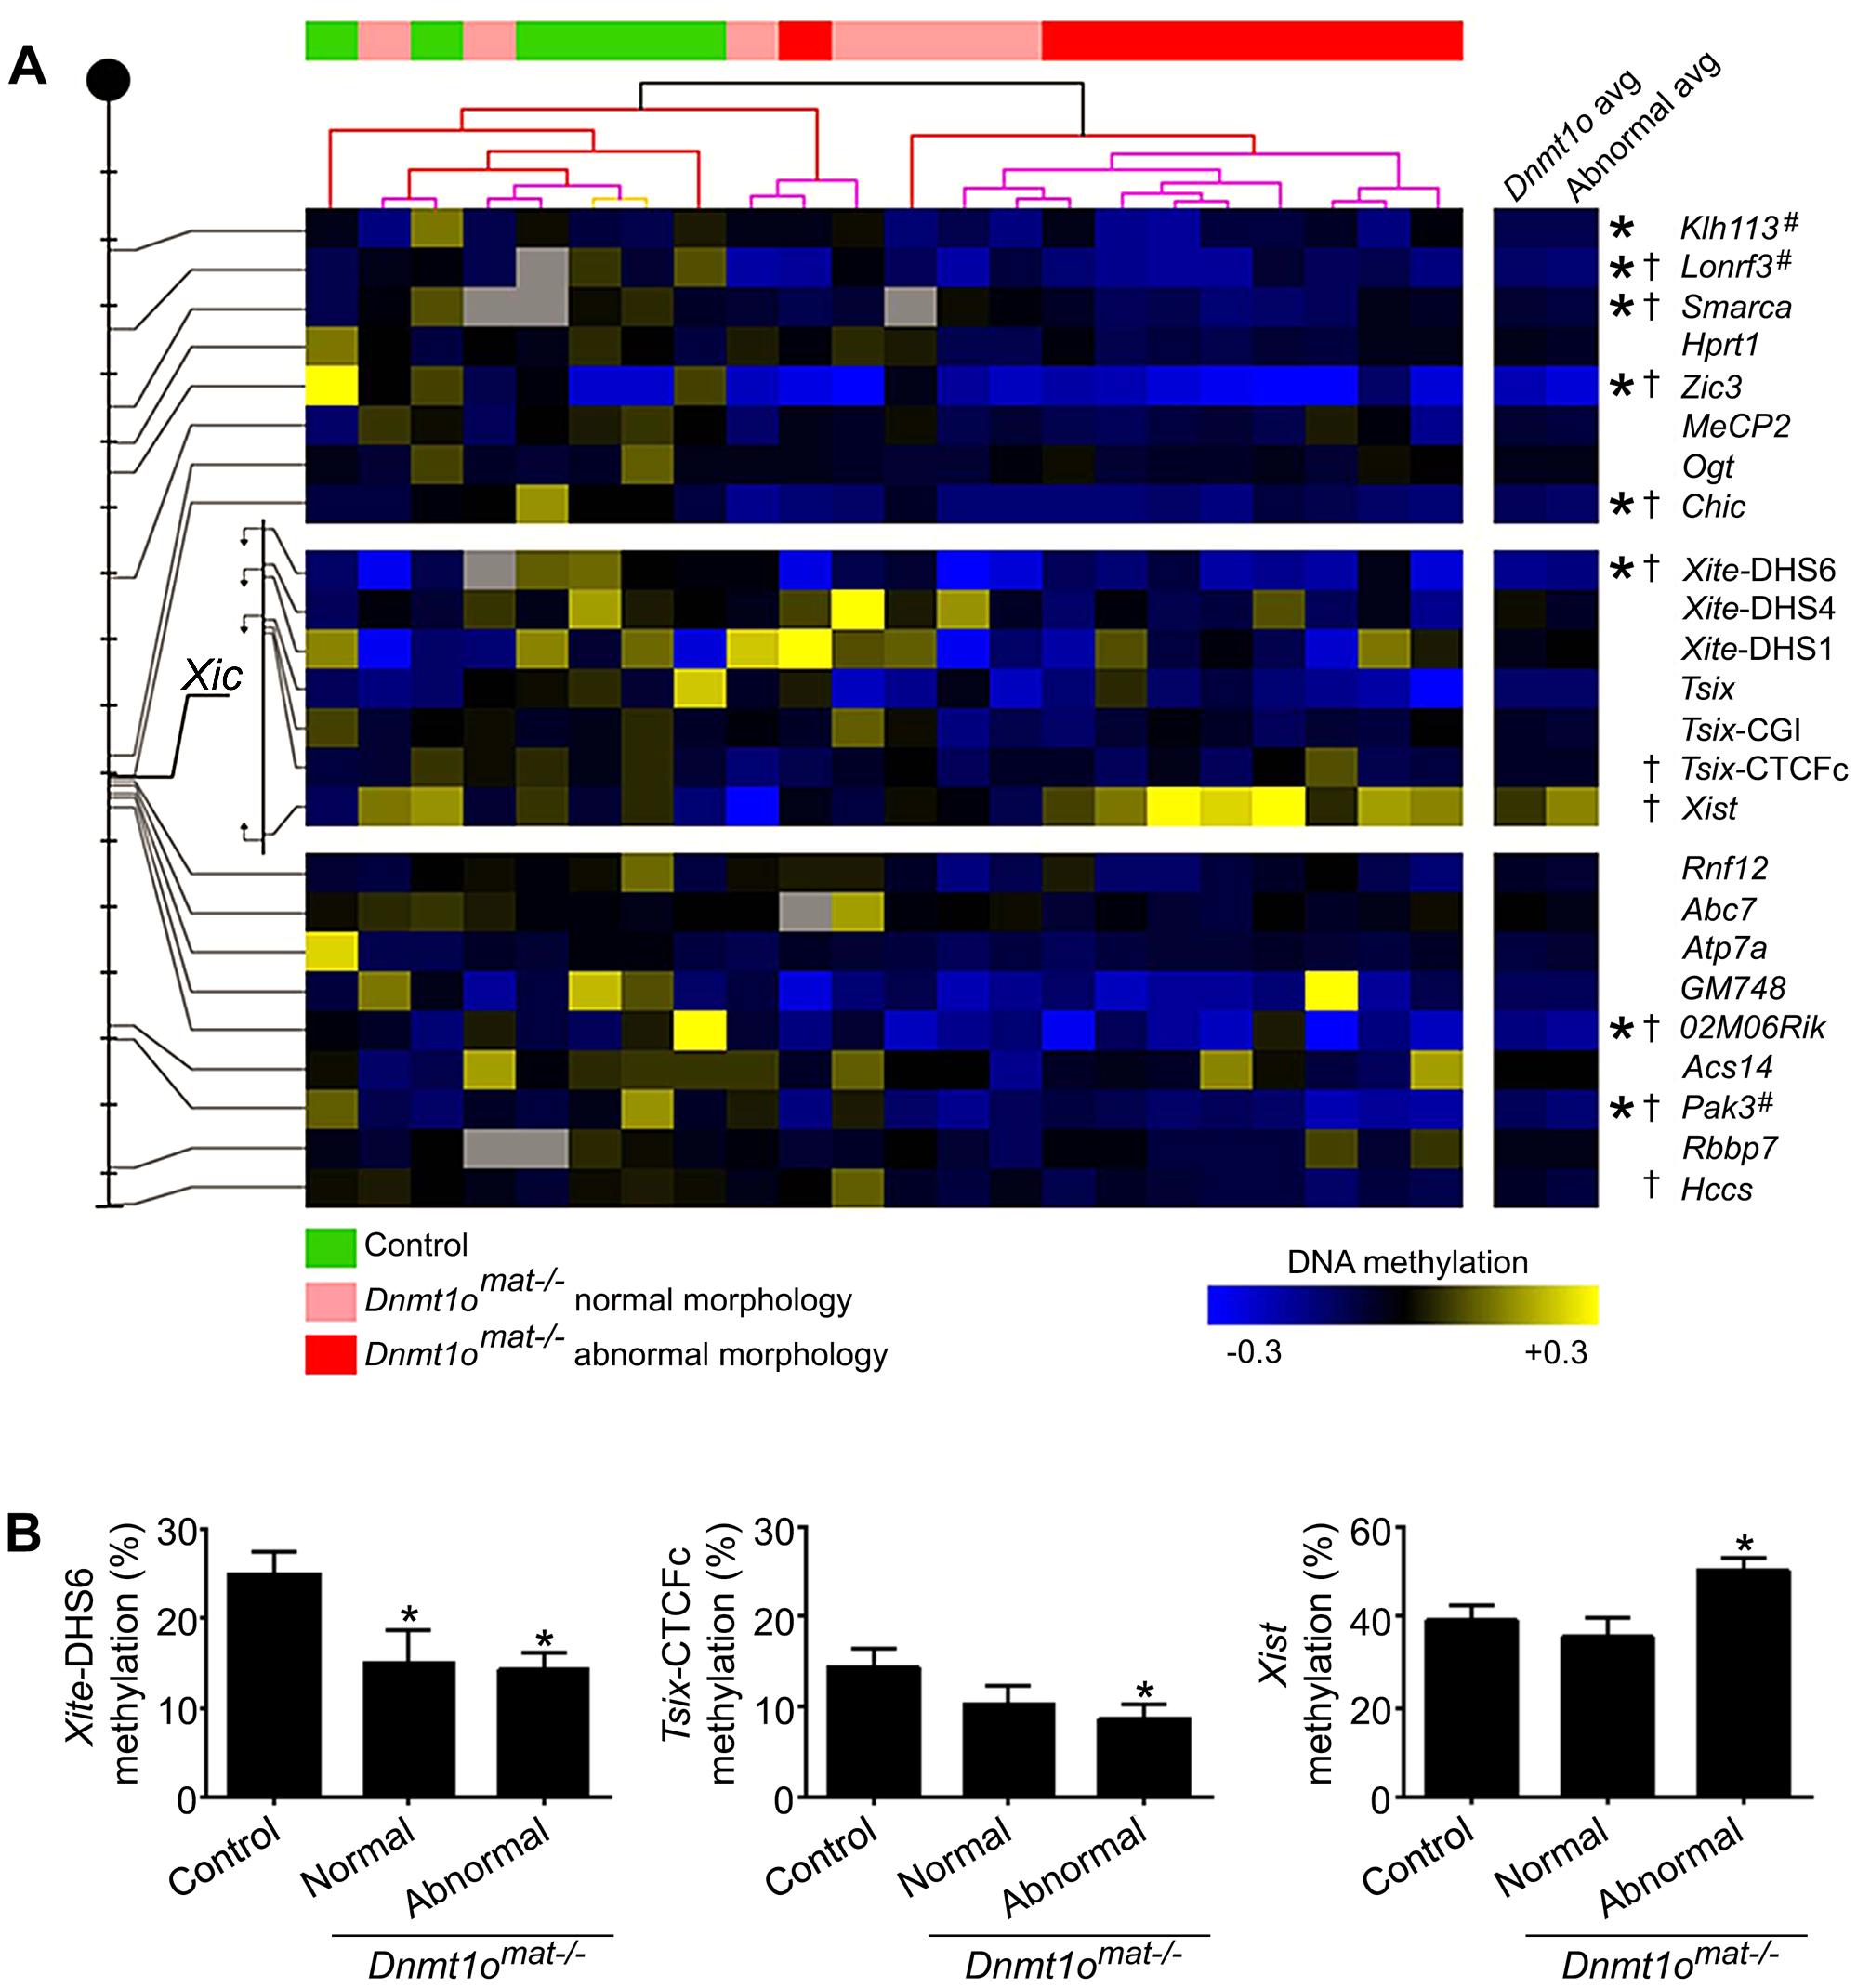 DNA methylation of X-CGI and <i>Xic</i> loci in <i>Dnmt1o<sup>mat−/−</sup></i> female placentae.